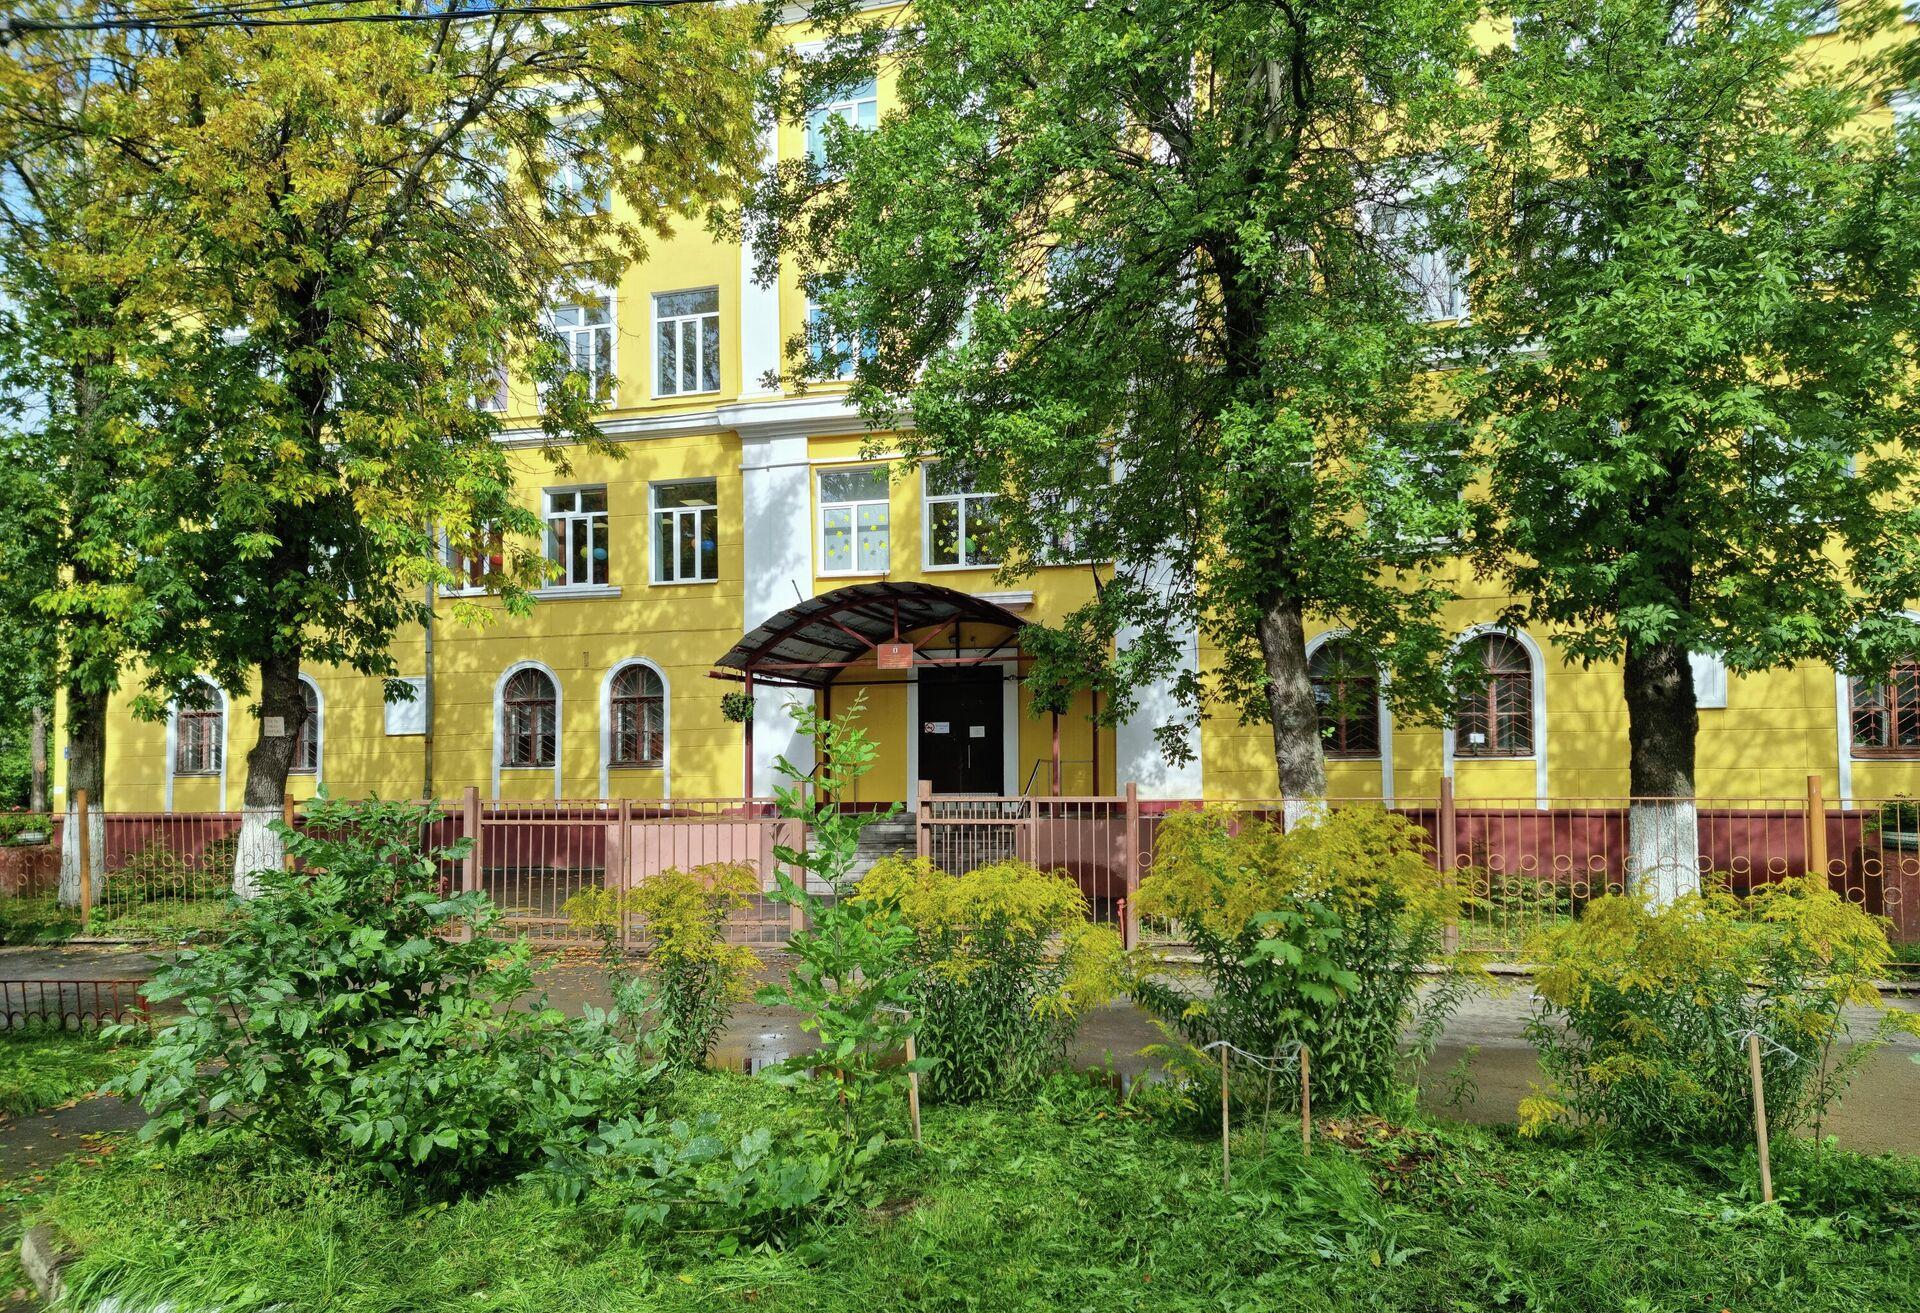 Школа №9 имени Ивана Ткаченко в Ярославле - РИА Новости, 1920, 05.09.2021